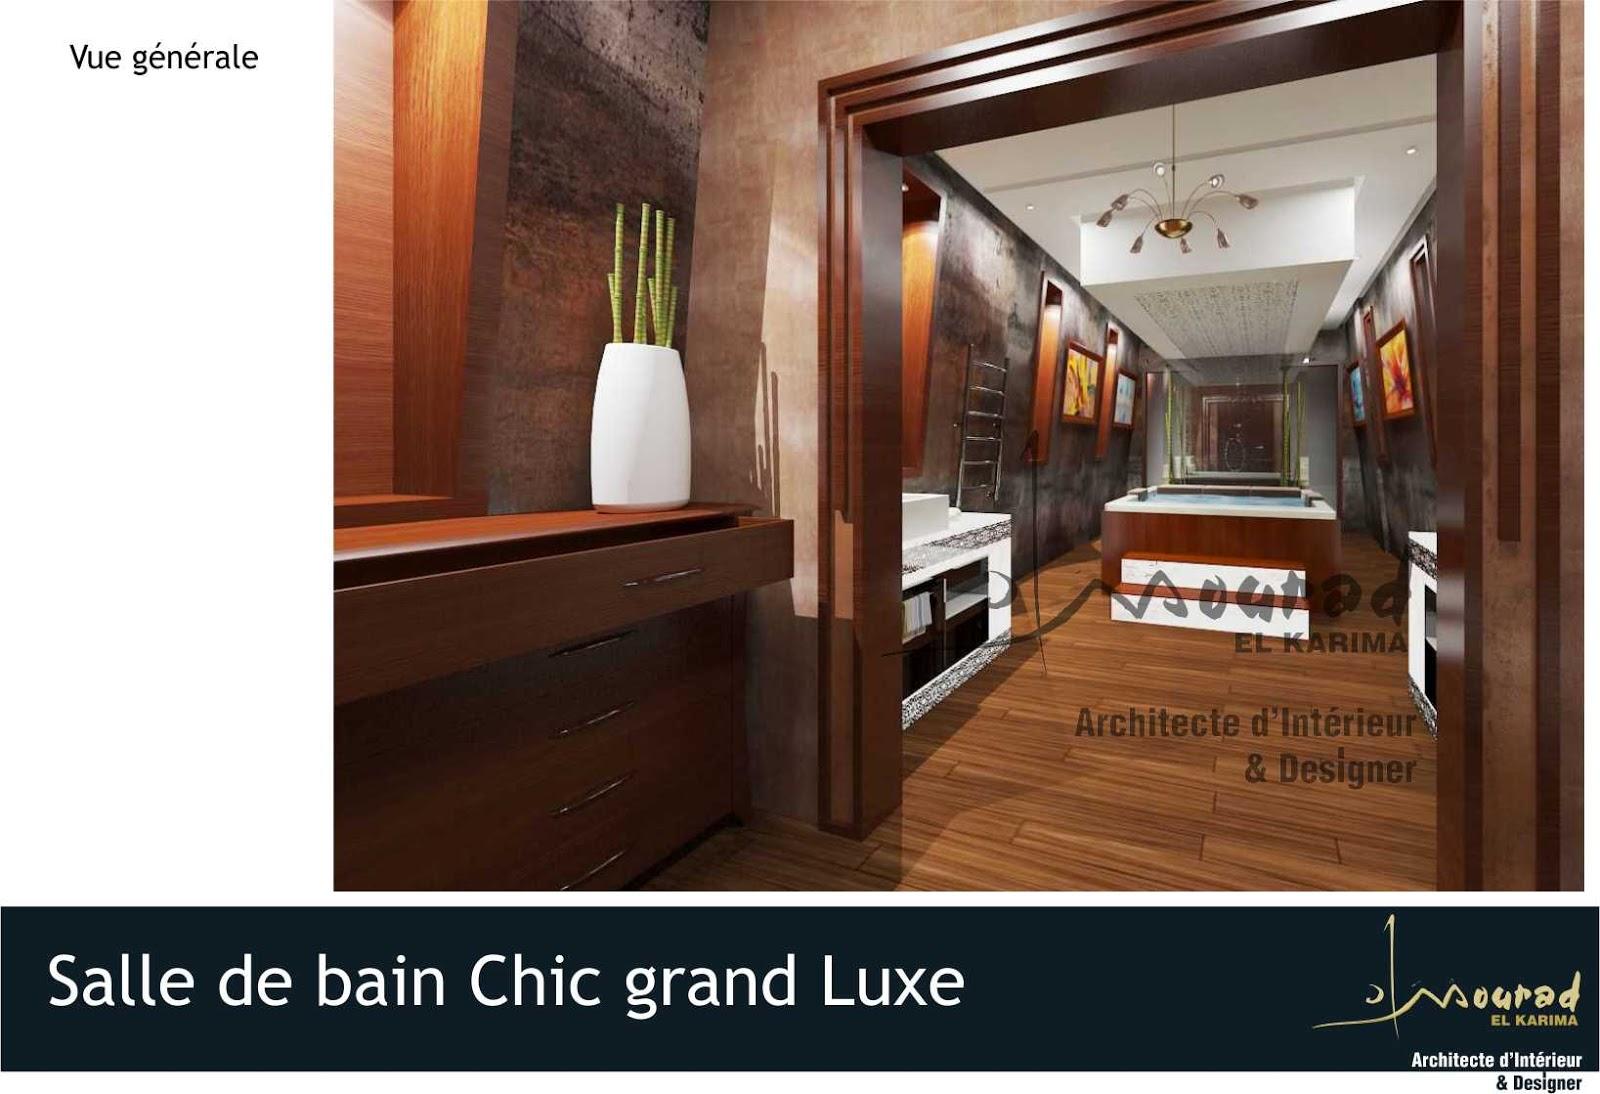 Mourad el karima architecte d 39 interieur designer for Salle de bain chic